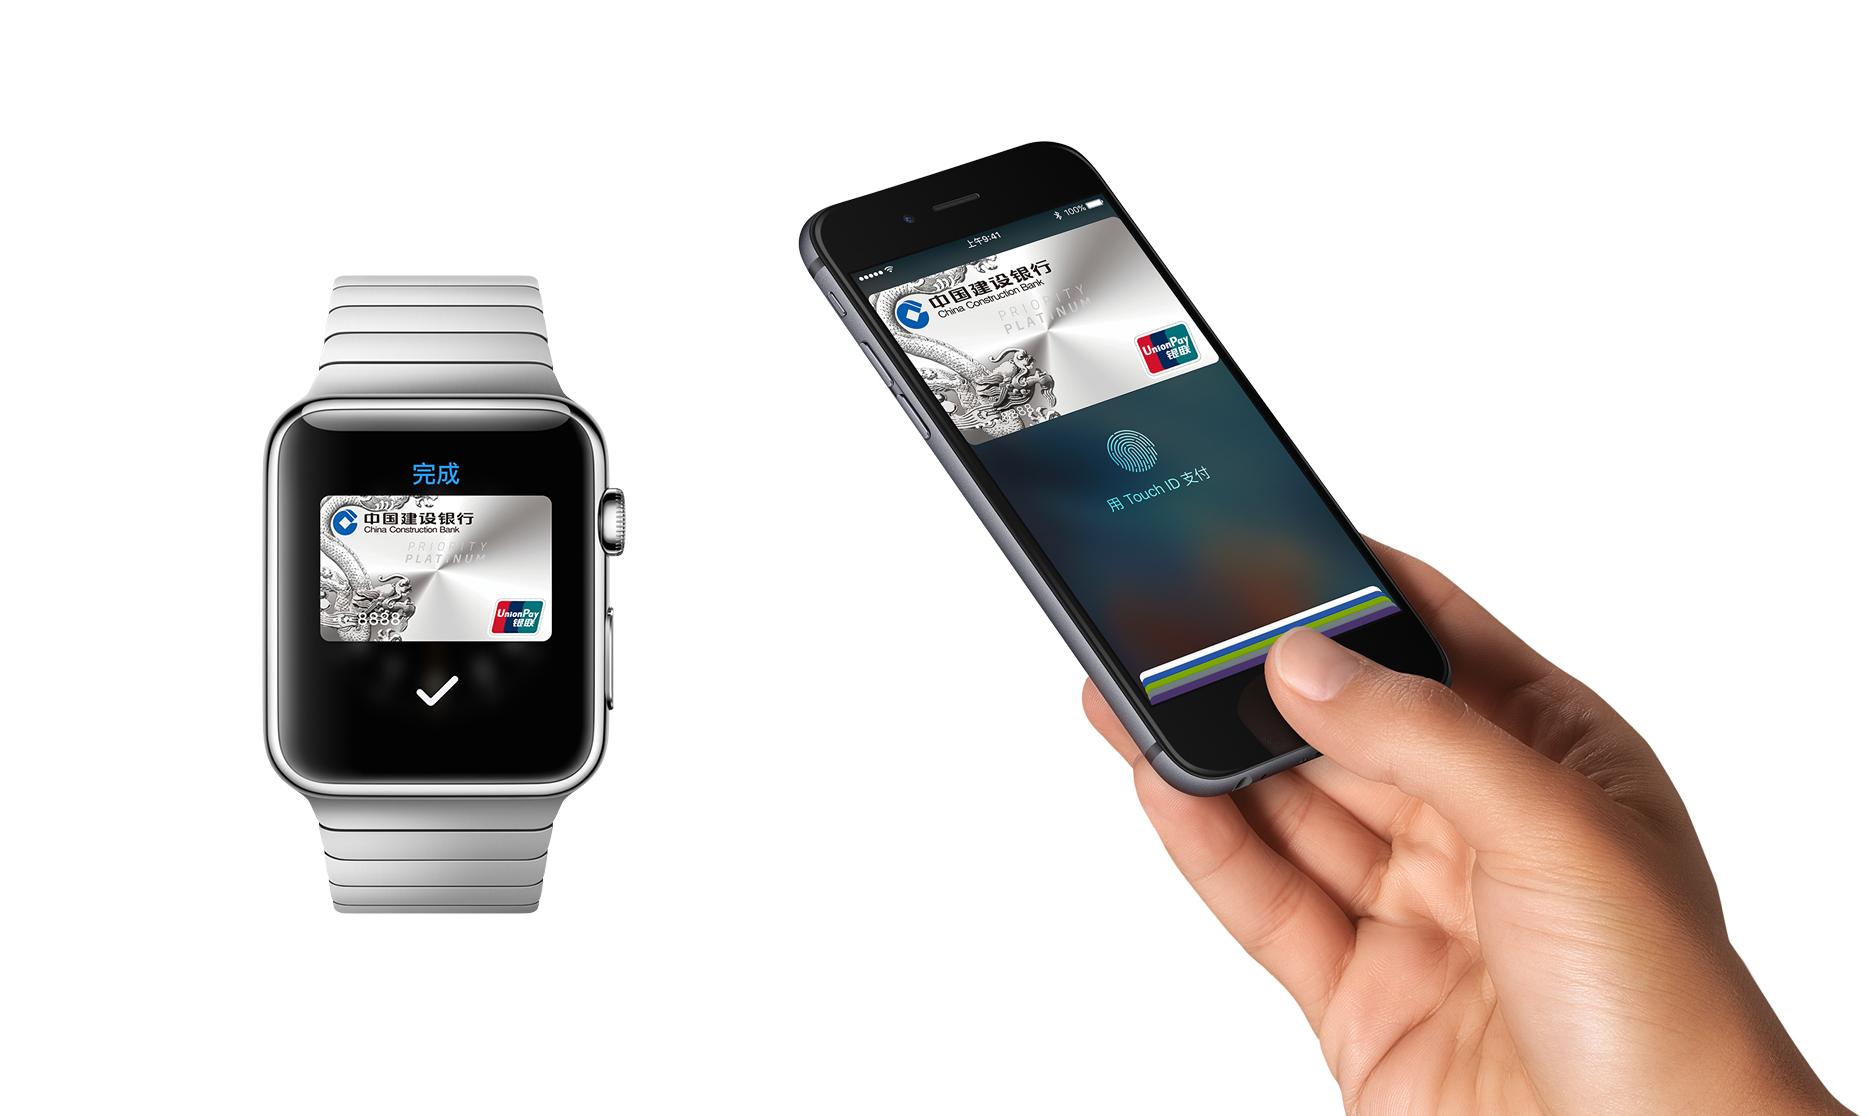 data-applenews-Apple_China_UnionPay_to_Bring_Apple_Pay_China